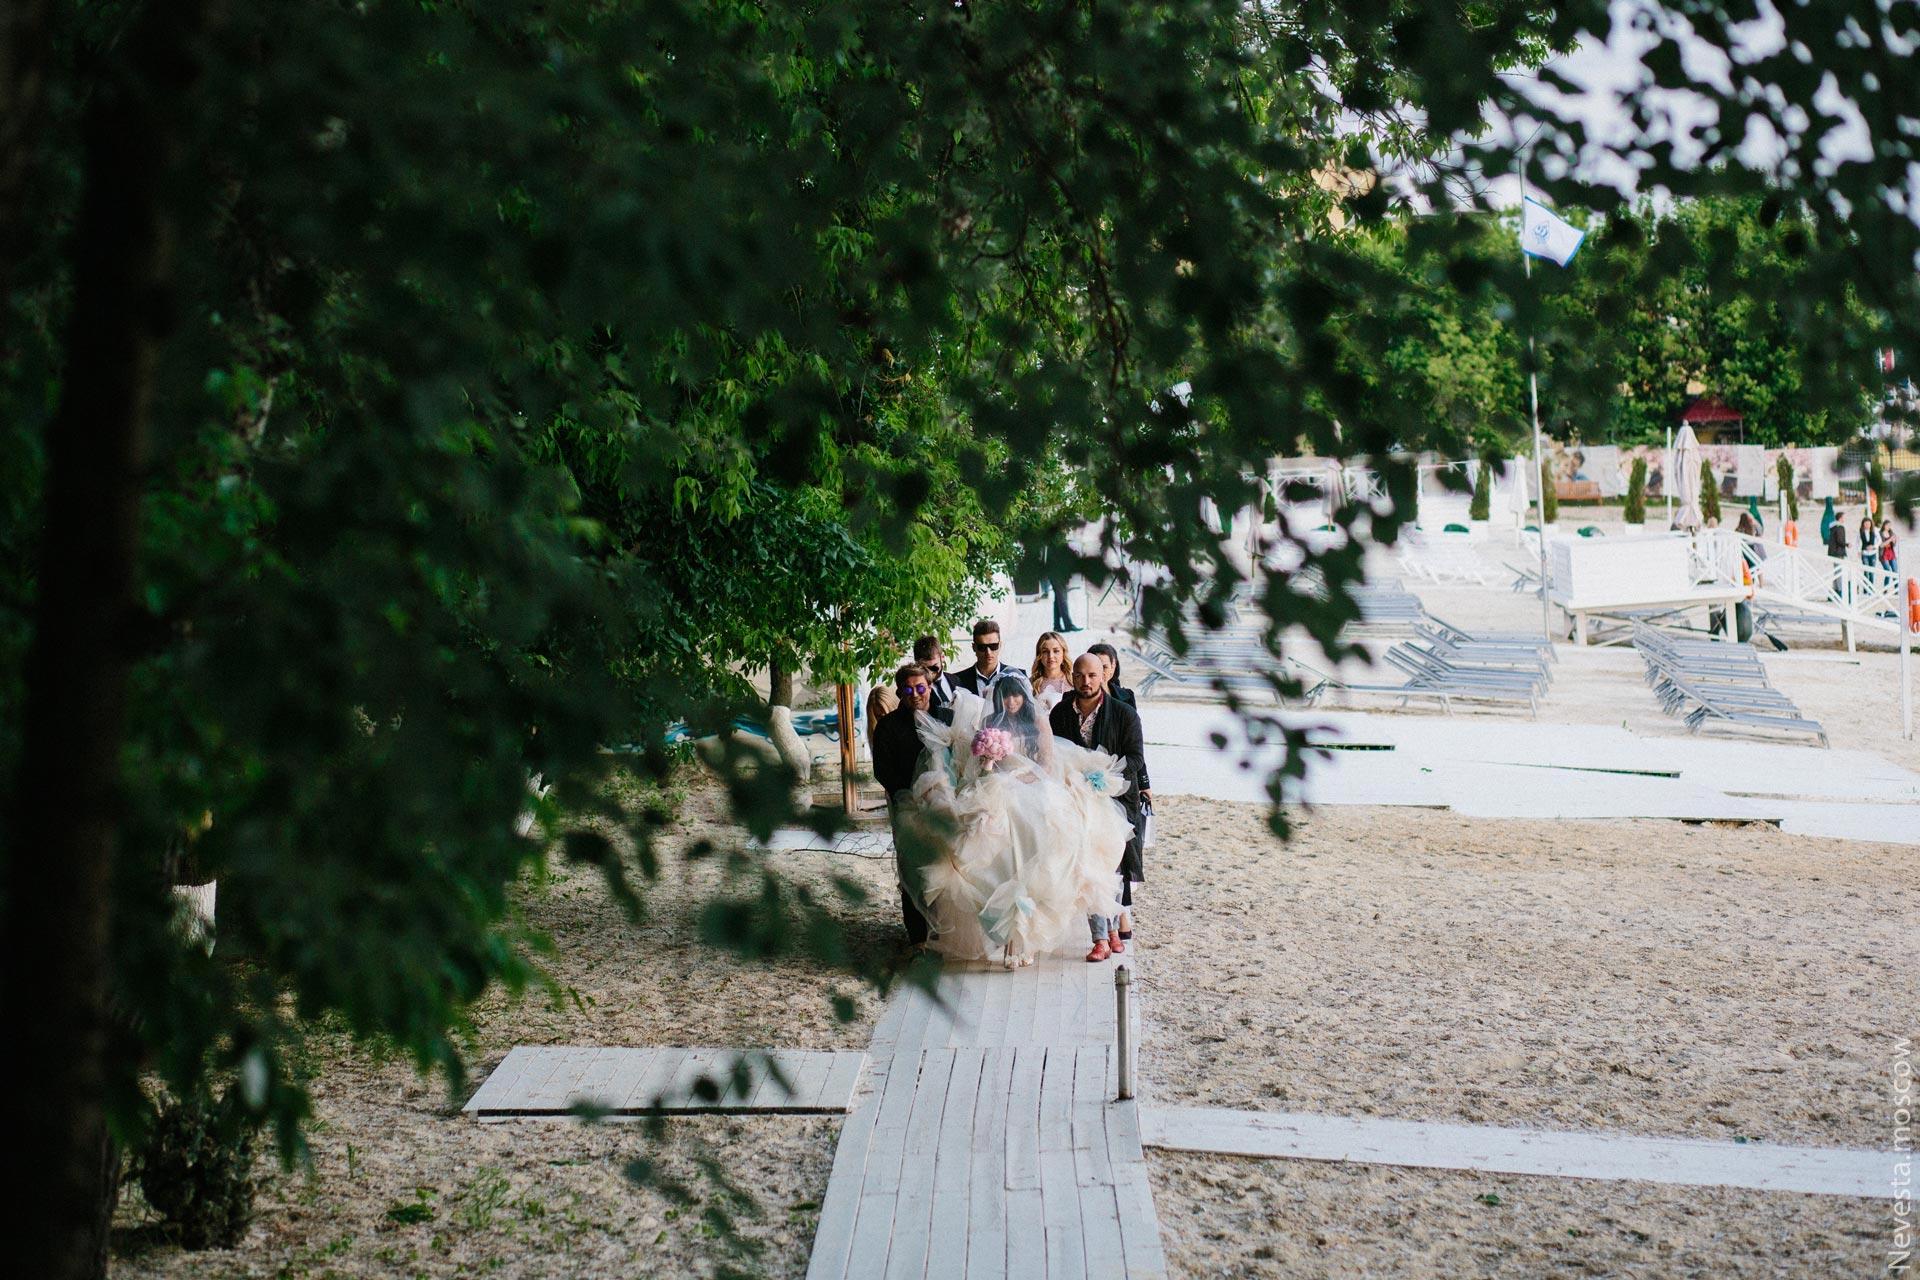 Свадьба Нелли Ермолаевой и Кирилла Андреева фото 25